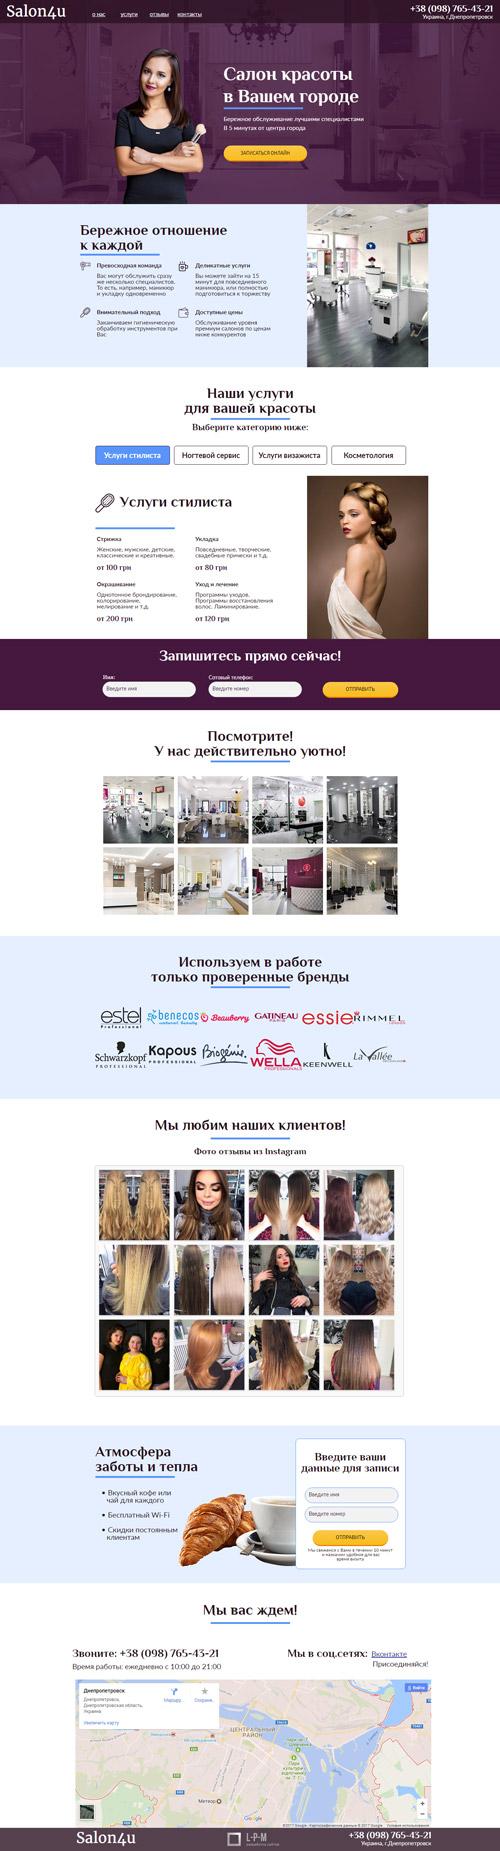 Шаблон лендинг сайт для салона красоты Adobe Muse